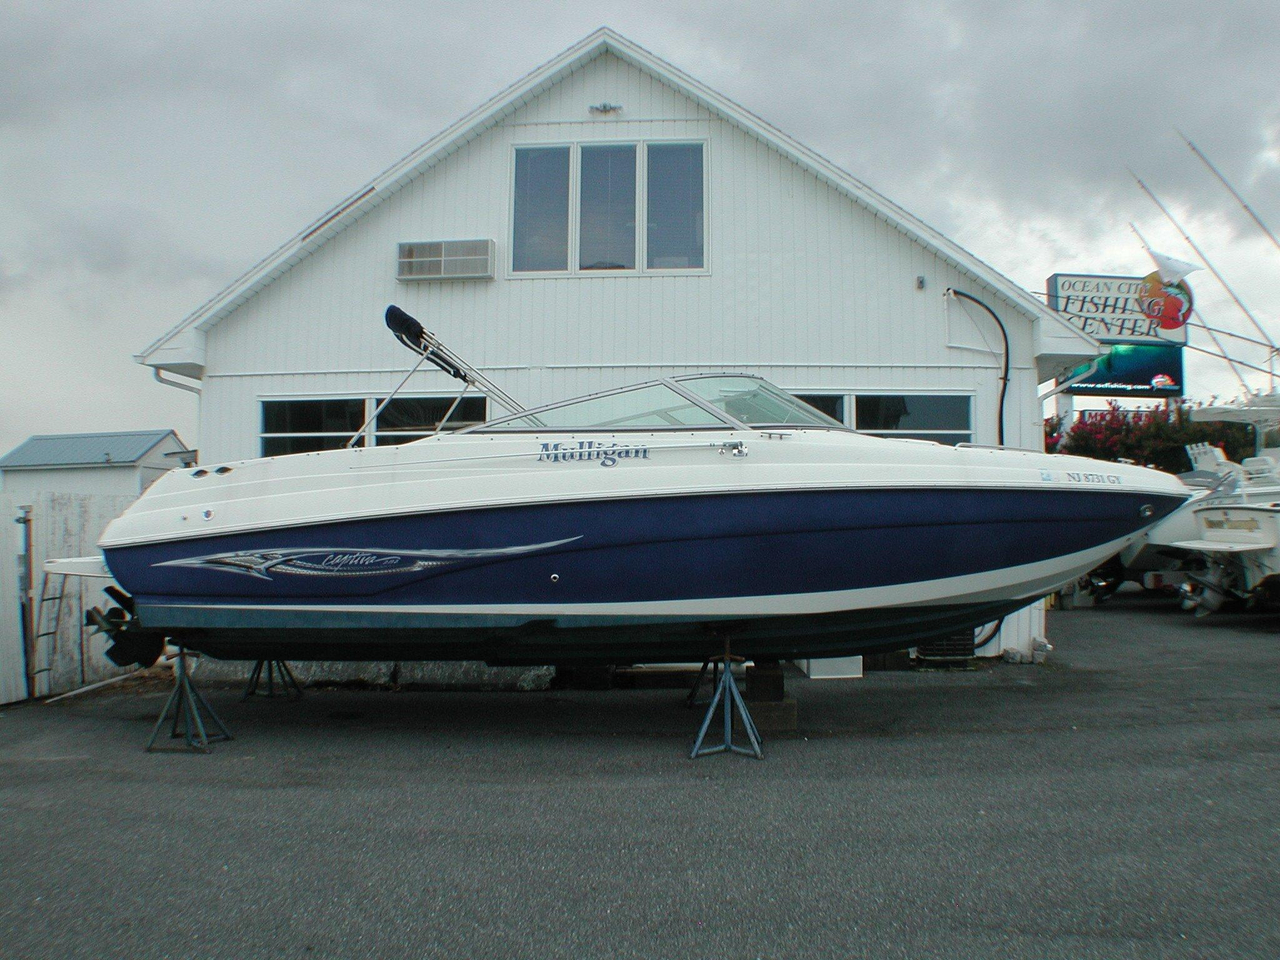 2007 Used Rinker 282 Captiva Bowrider Boat For Sale